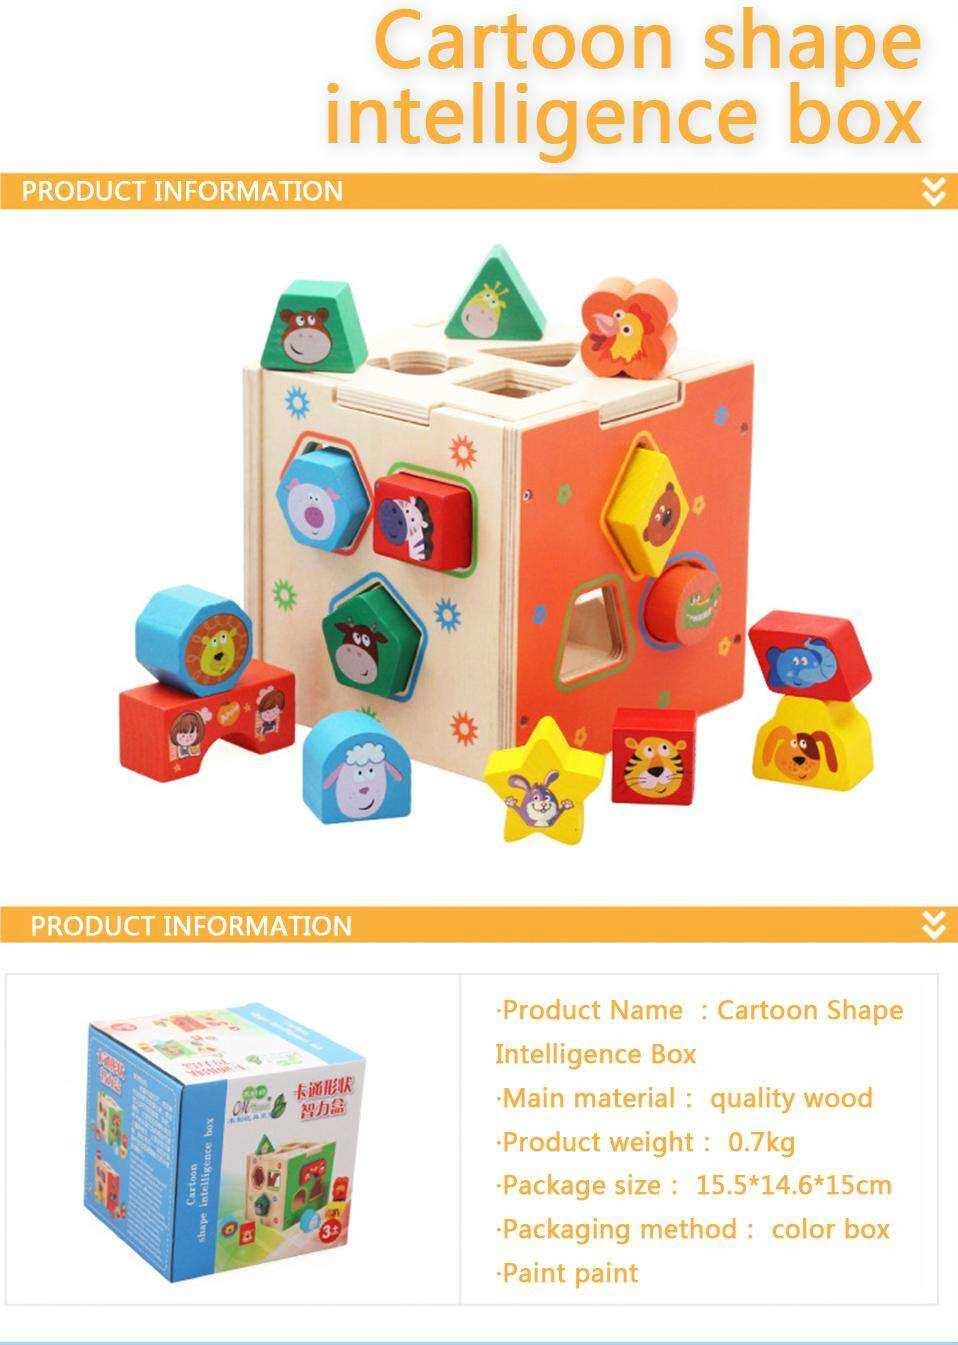 Geometric Shape Wooden Montessori Educational Toy Pairing Blocks Cartoon Box Preschool Toys For Toddler Phoohi Lazada Singapore